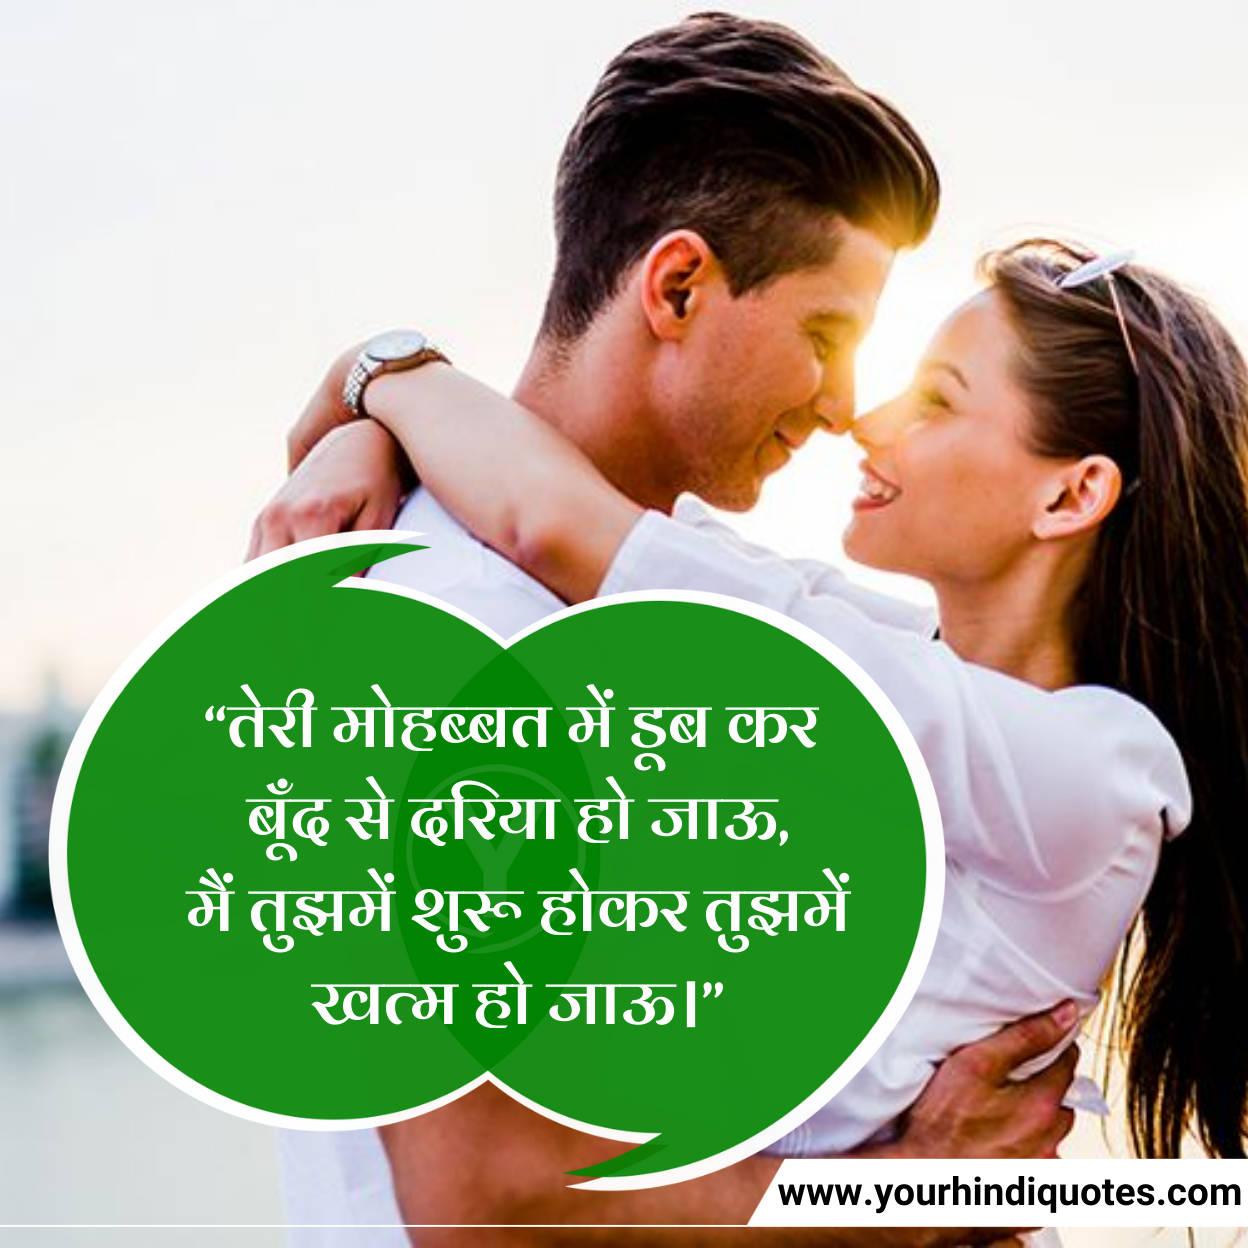 Pyar Shayari Images Shayari Photos